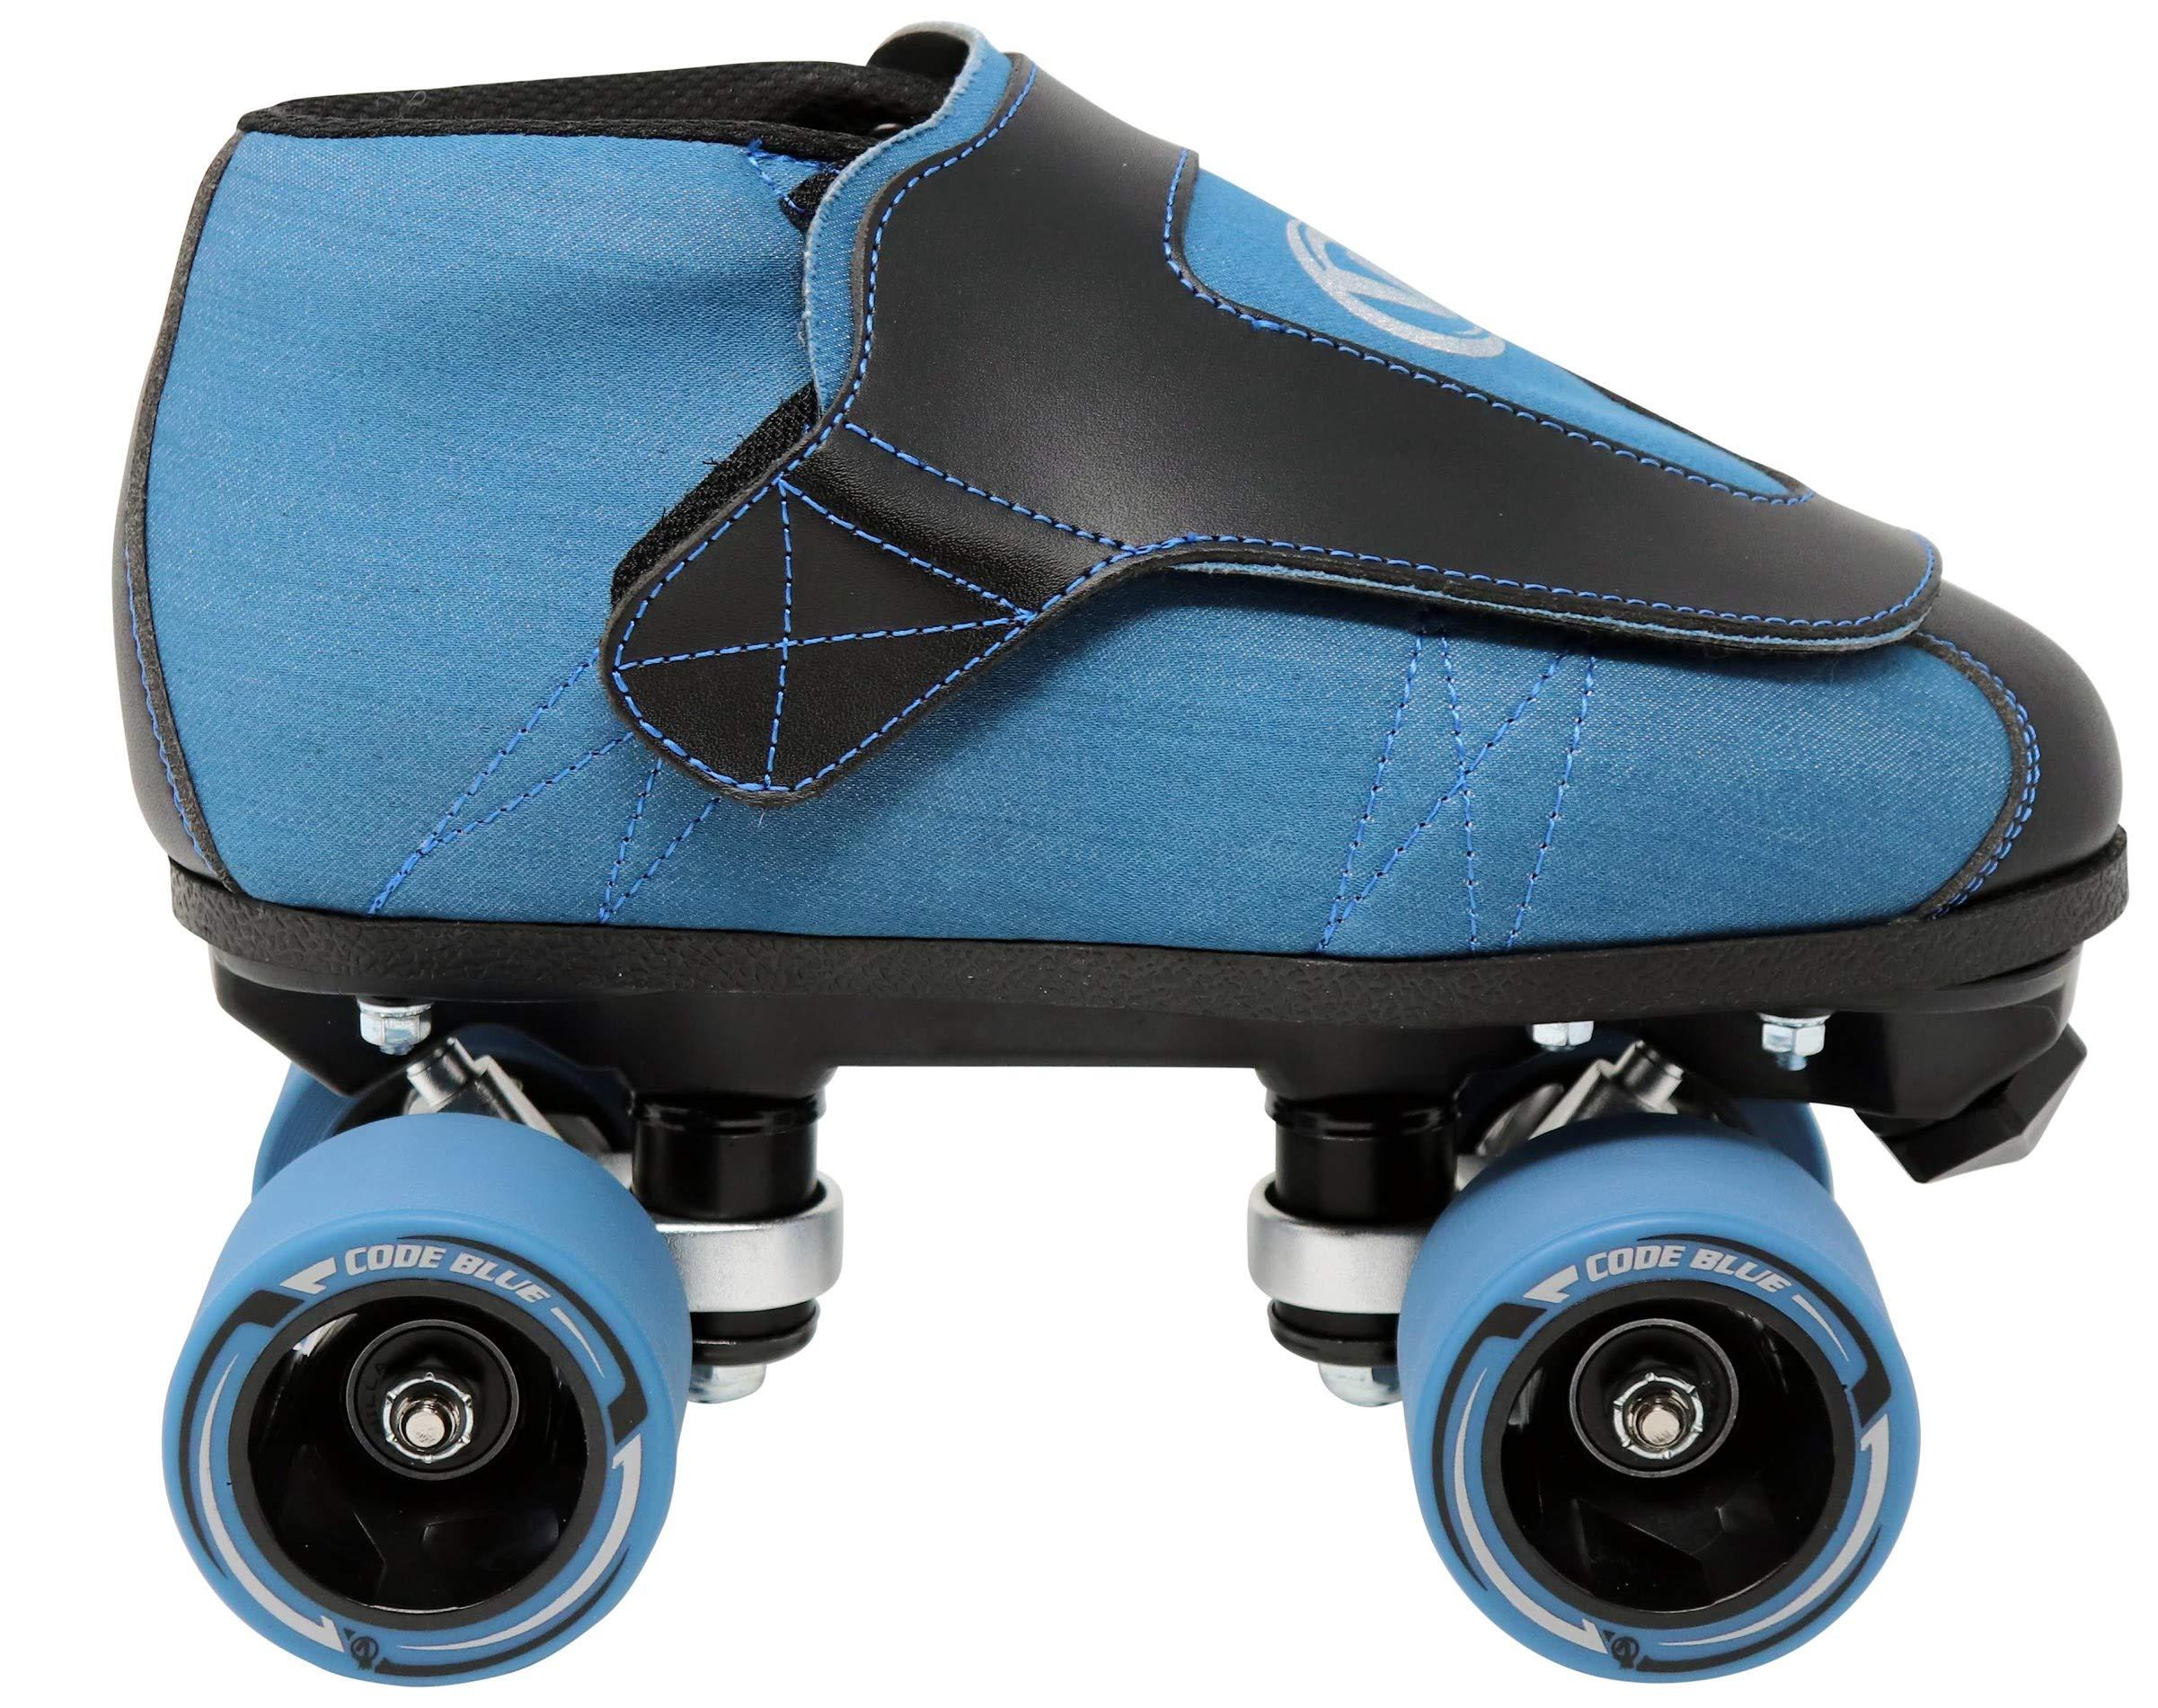 VNLA Code Blue Jam Skate - Mens & Womens Speed Skates - Quad Skates for Women & Men - Adjustable Roller Skate/Rollerskates - Outdoor & Indoor Adult Quad Skate - Kid/Kids Roller Skates (Size 4) by VNLA (Image #2)